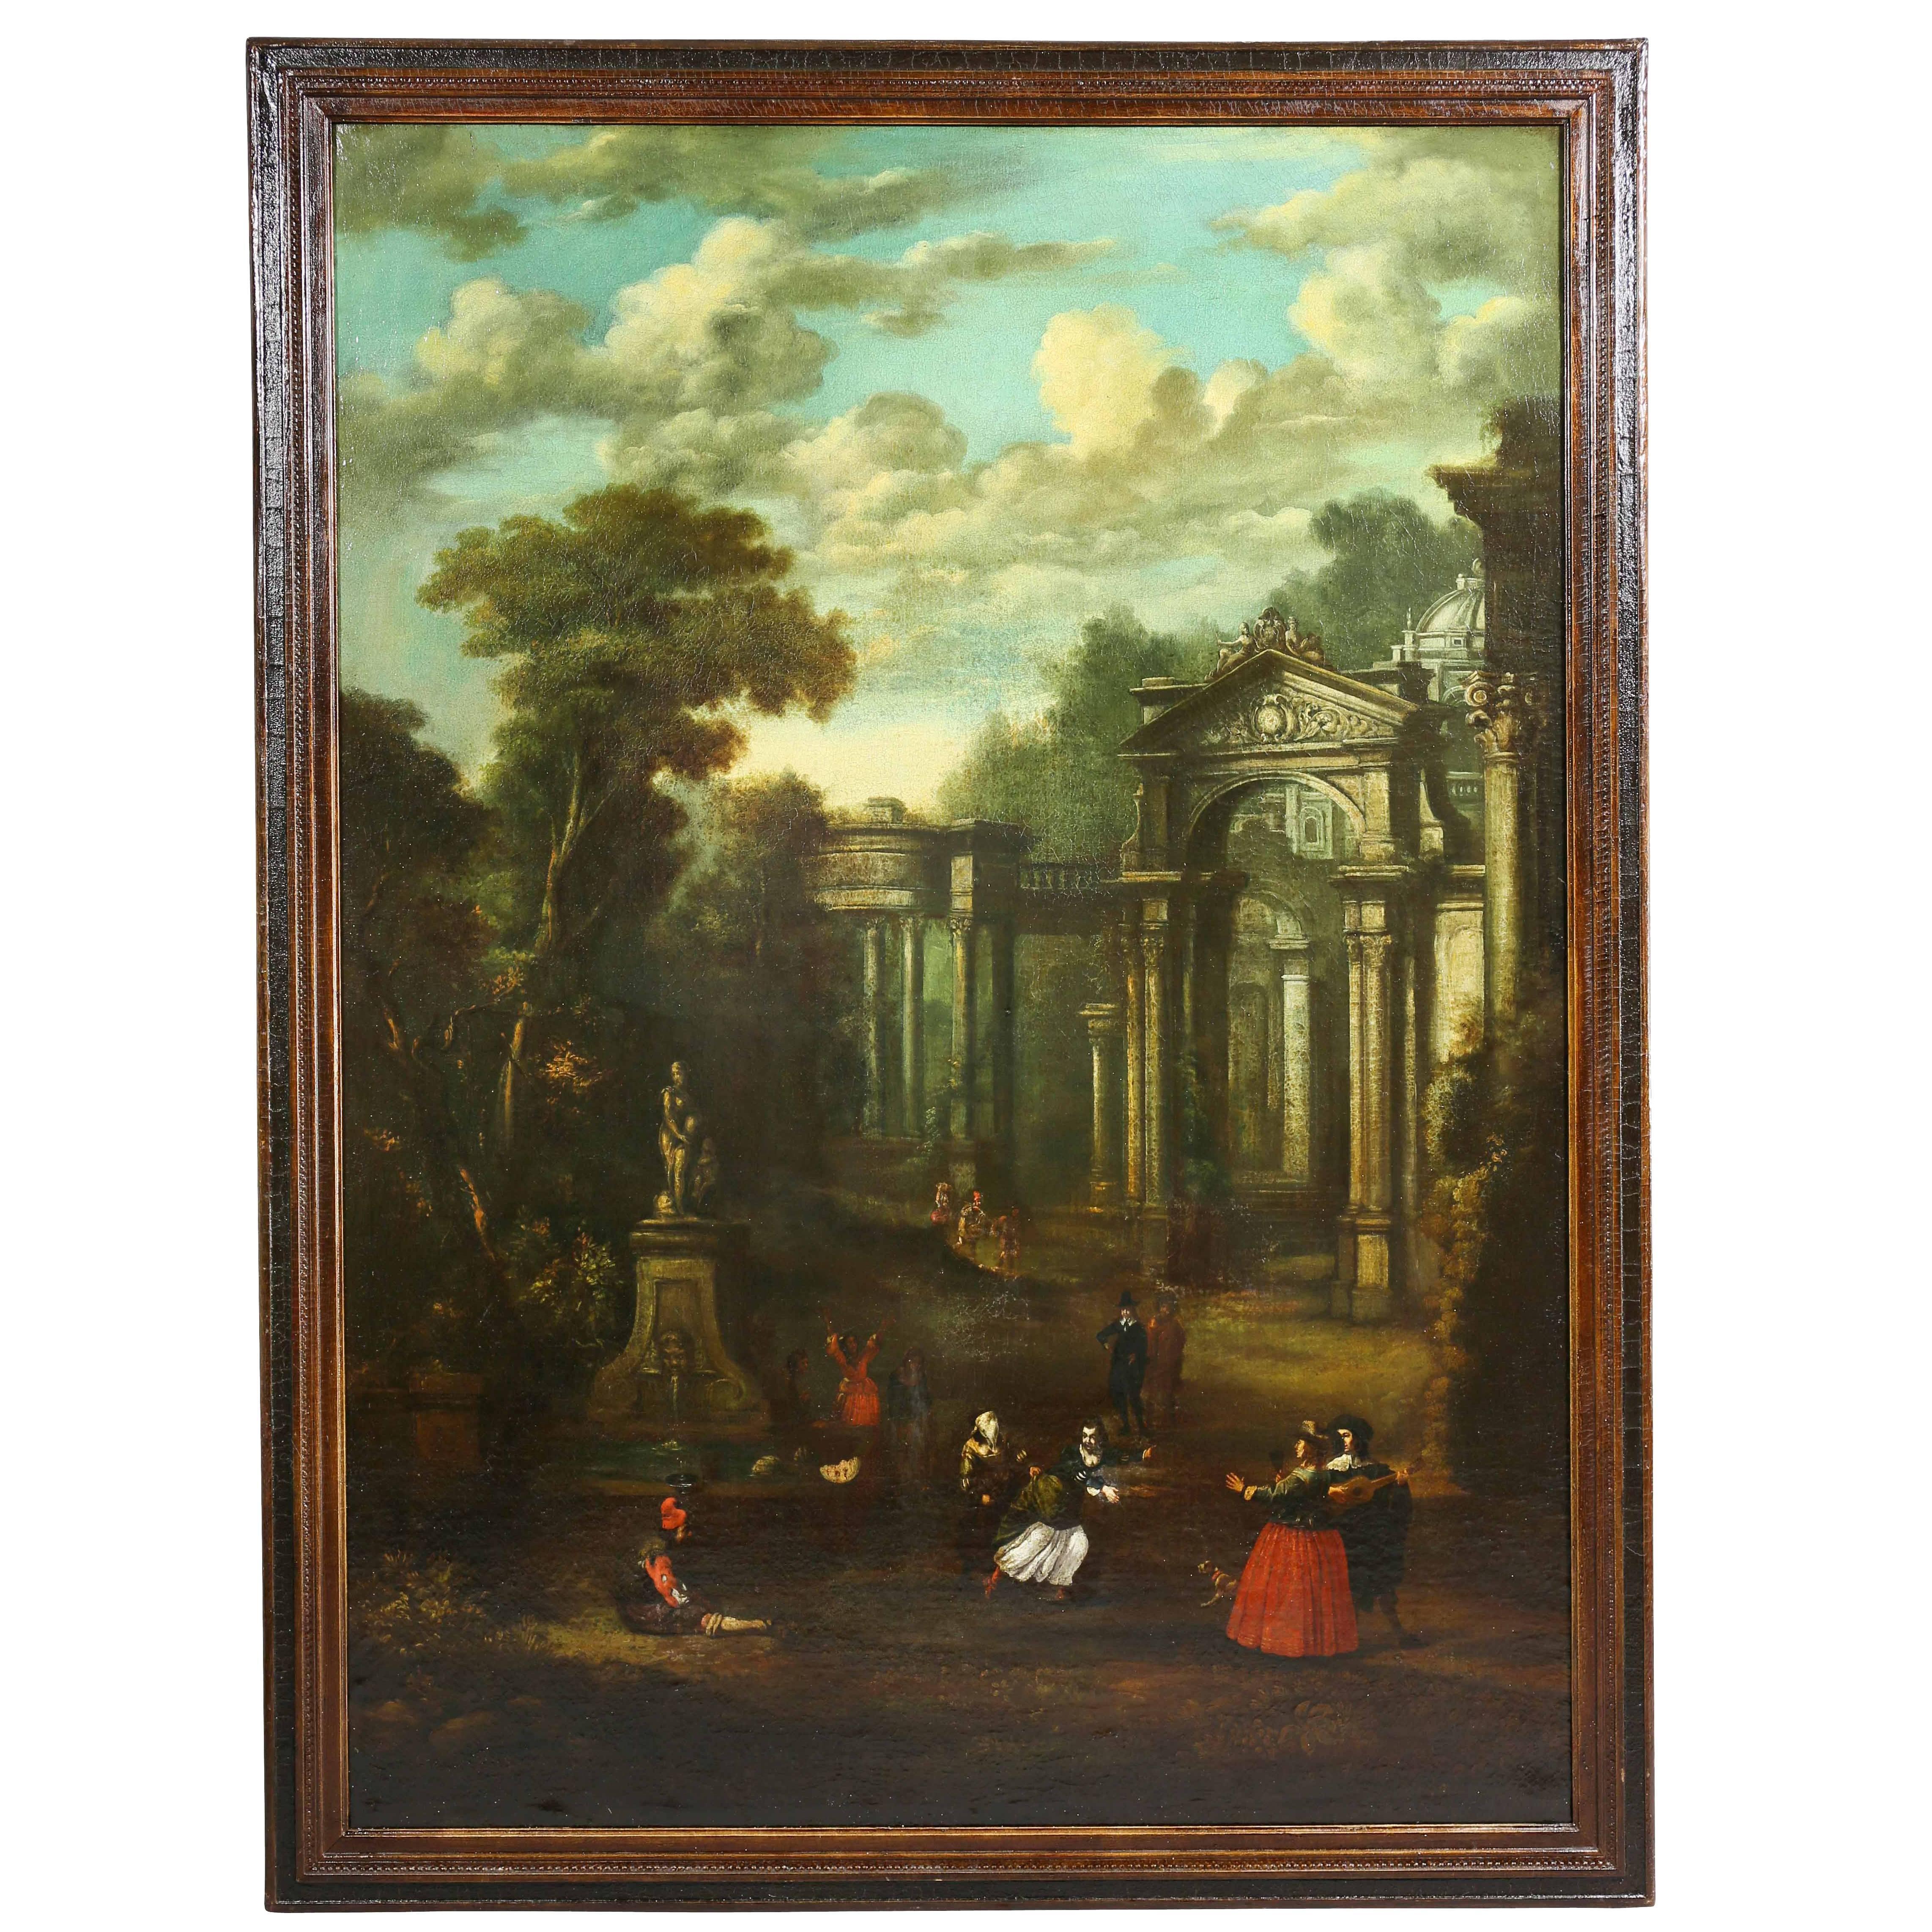 Flemish Oil on Canvas Capriccio by John Miel